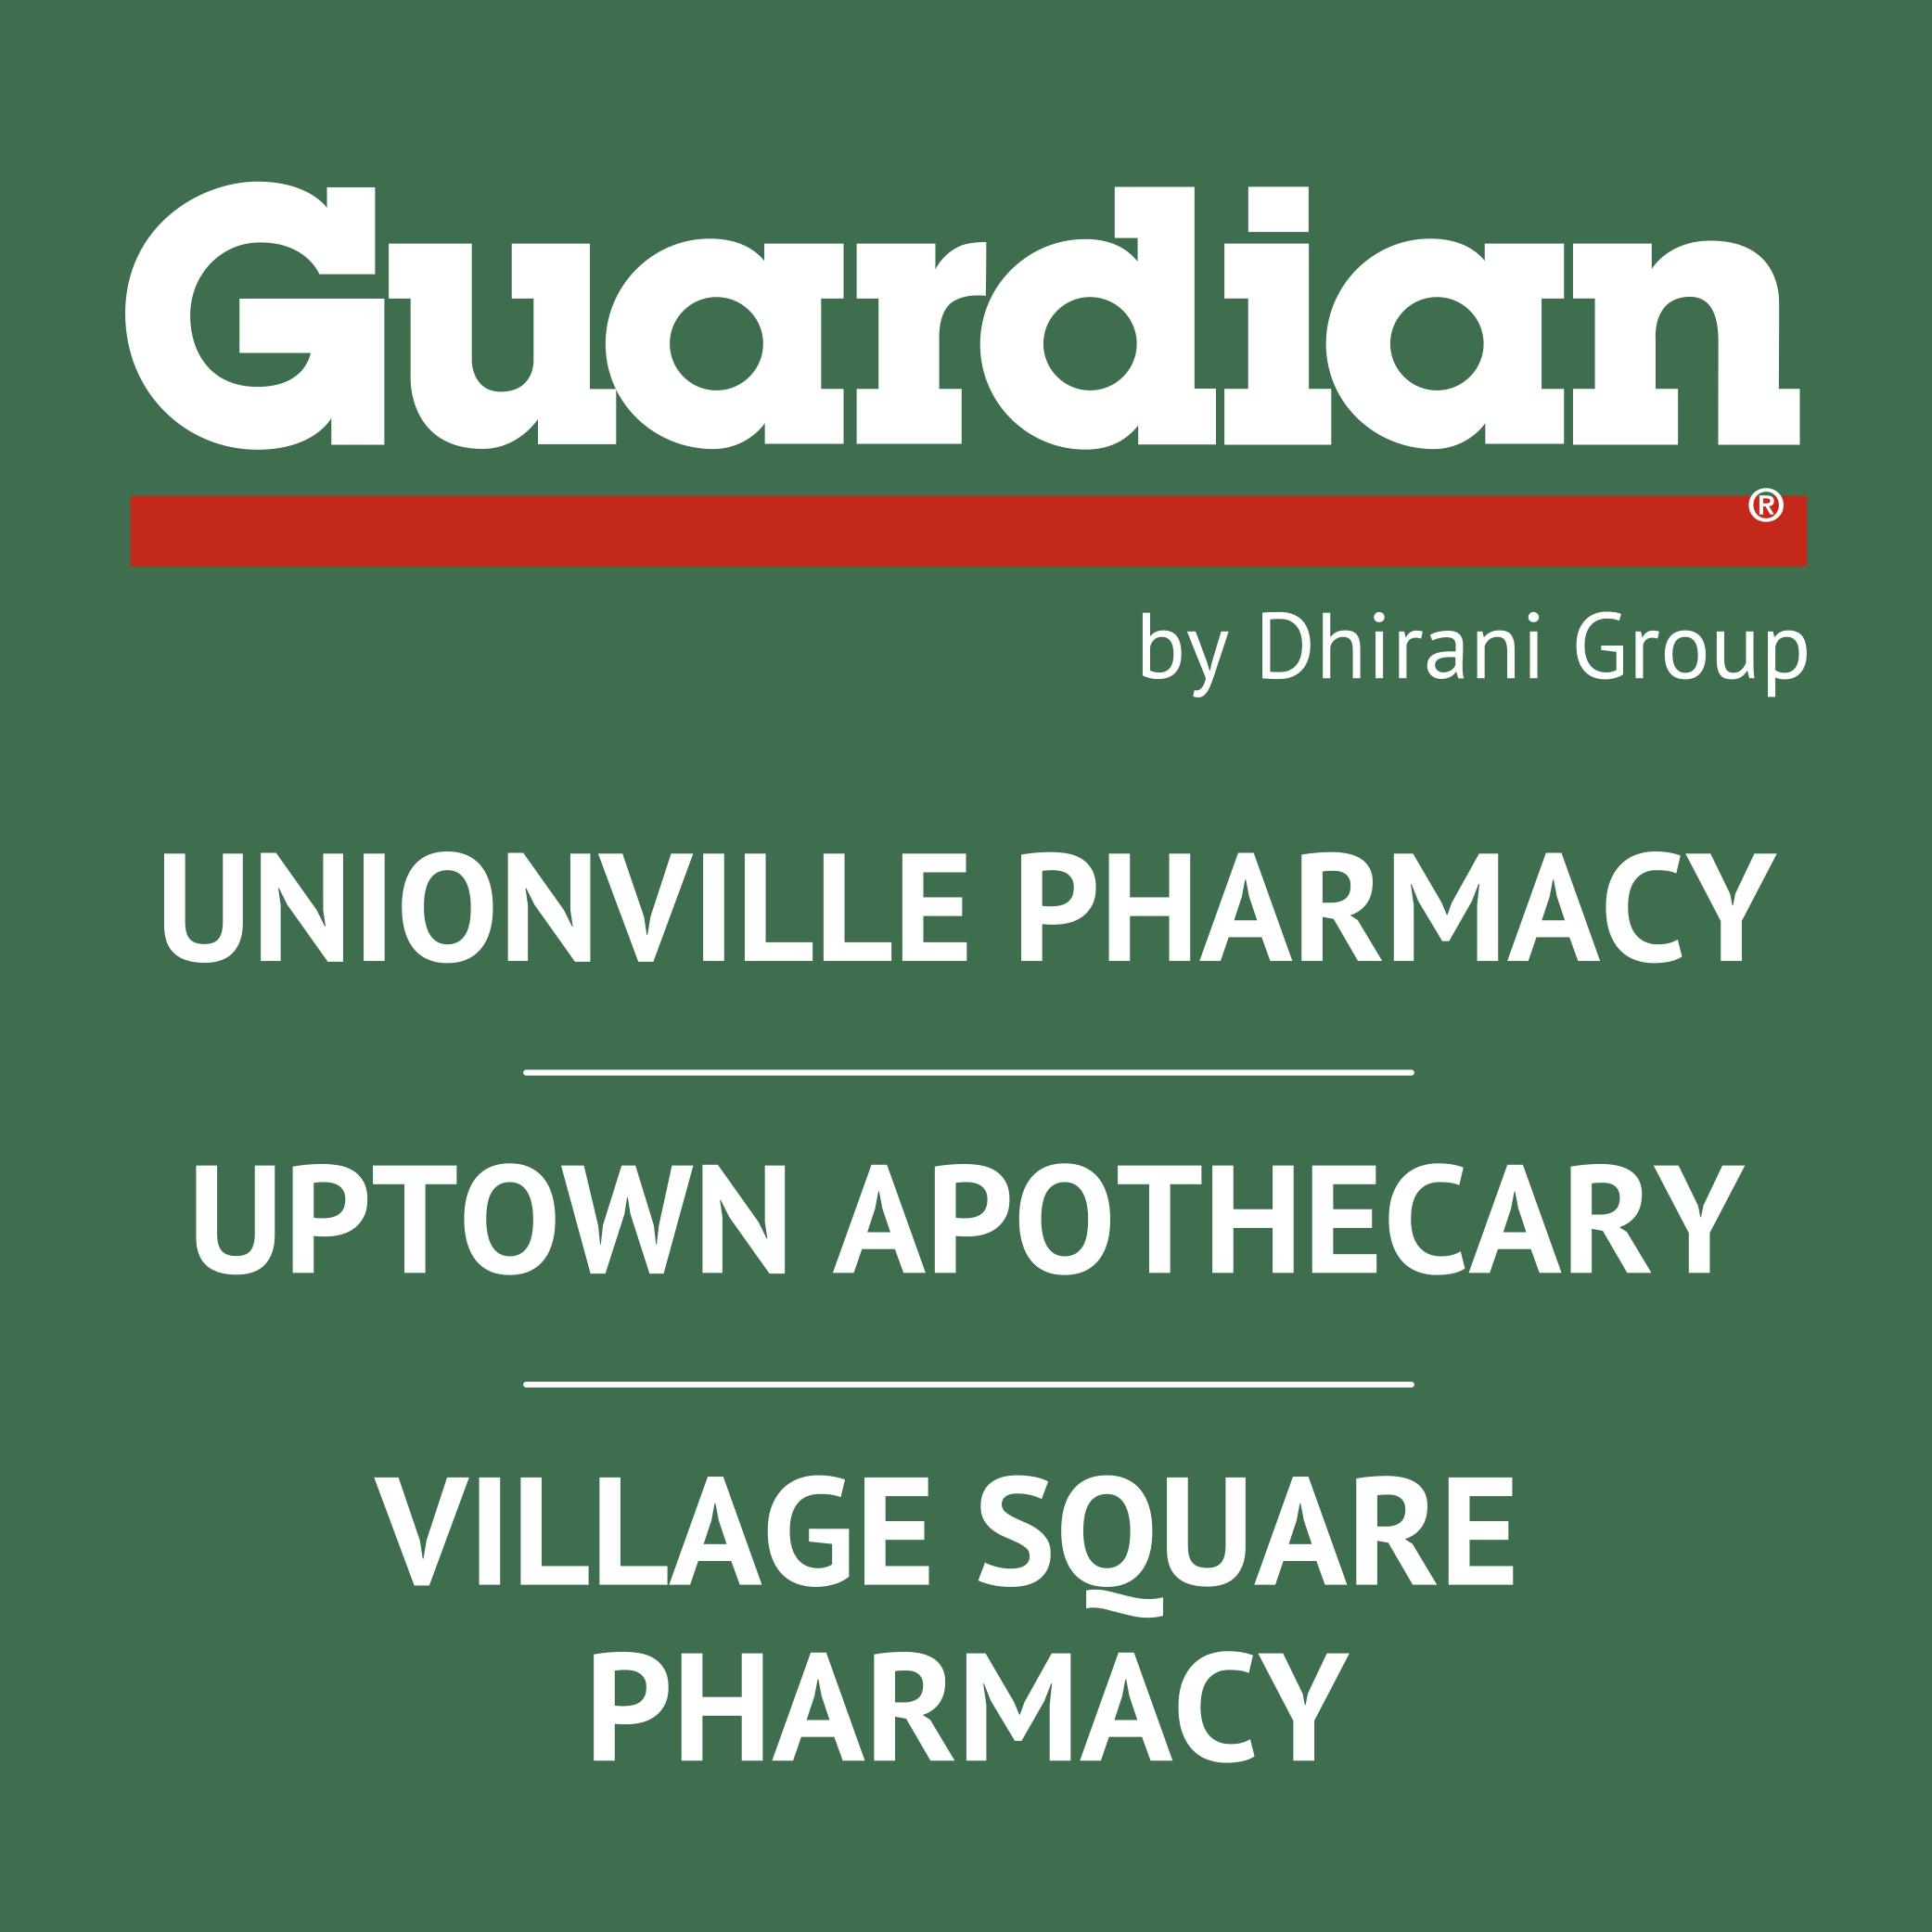 gdn-dhirani-group_logo-lockup_2019-04-26